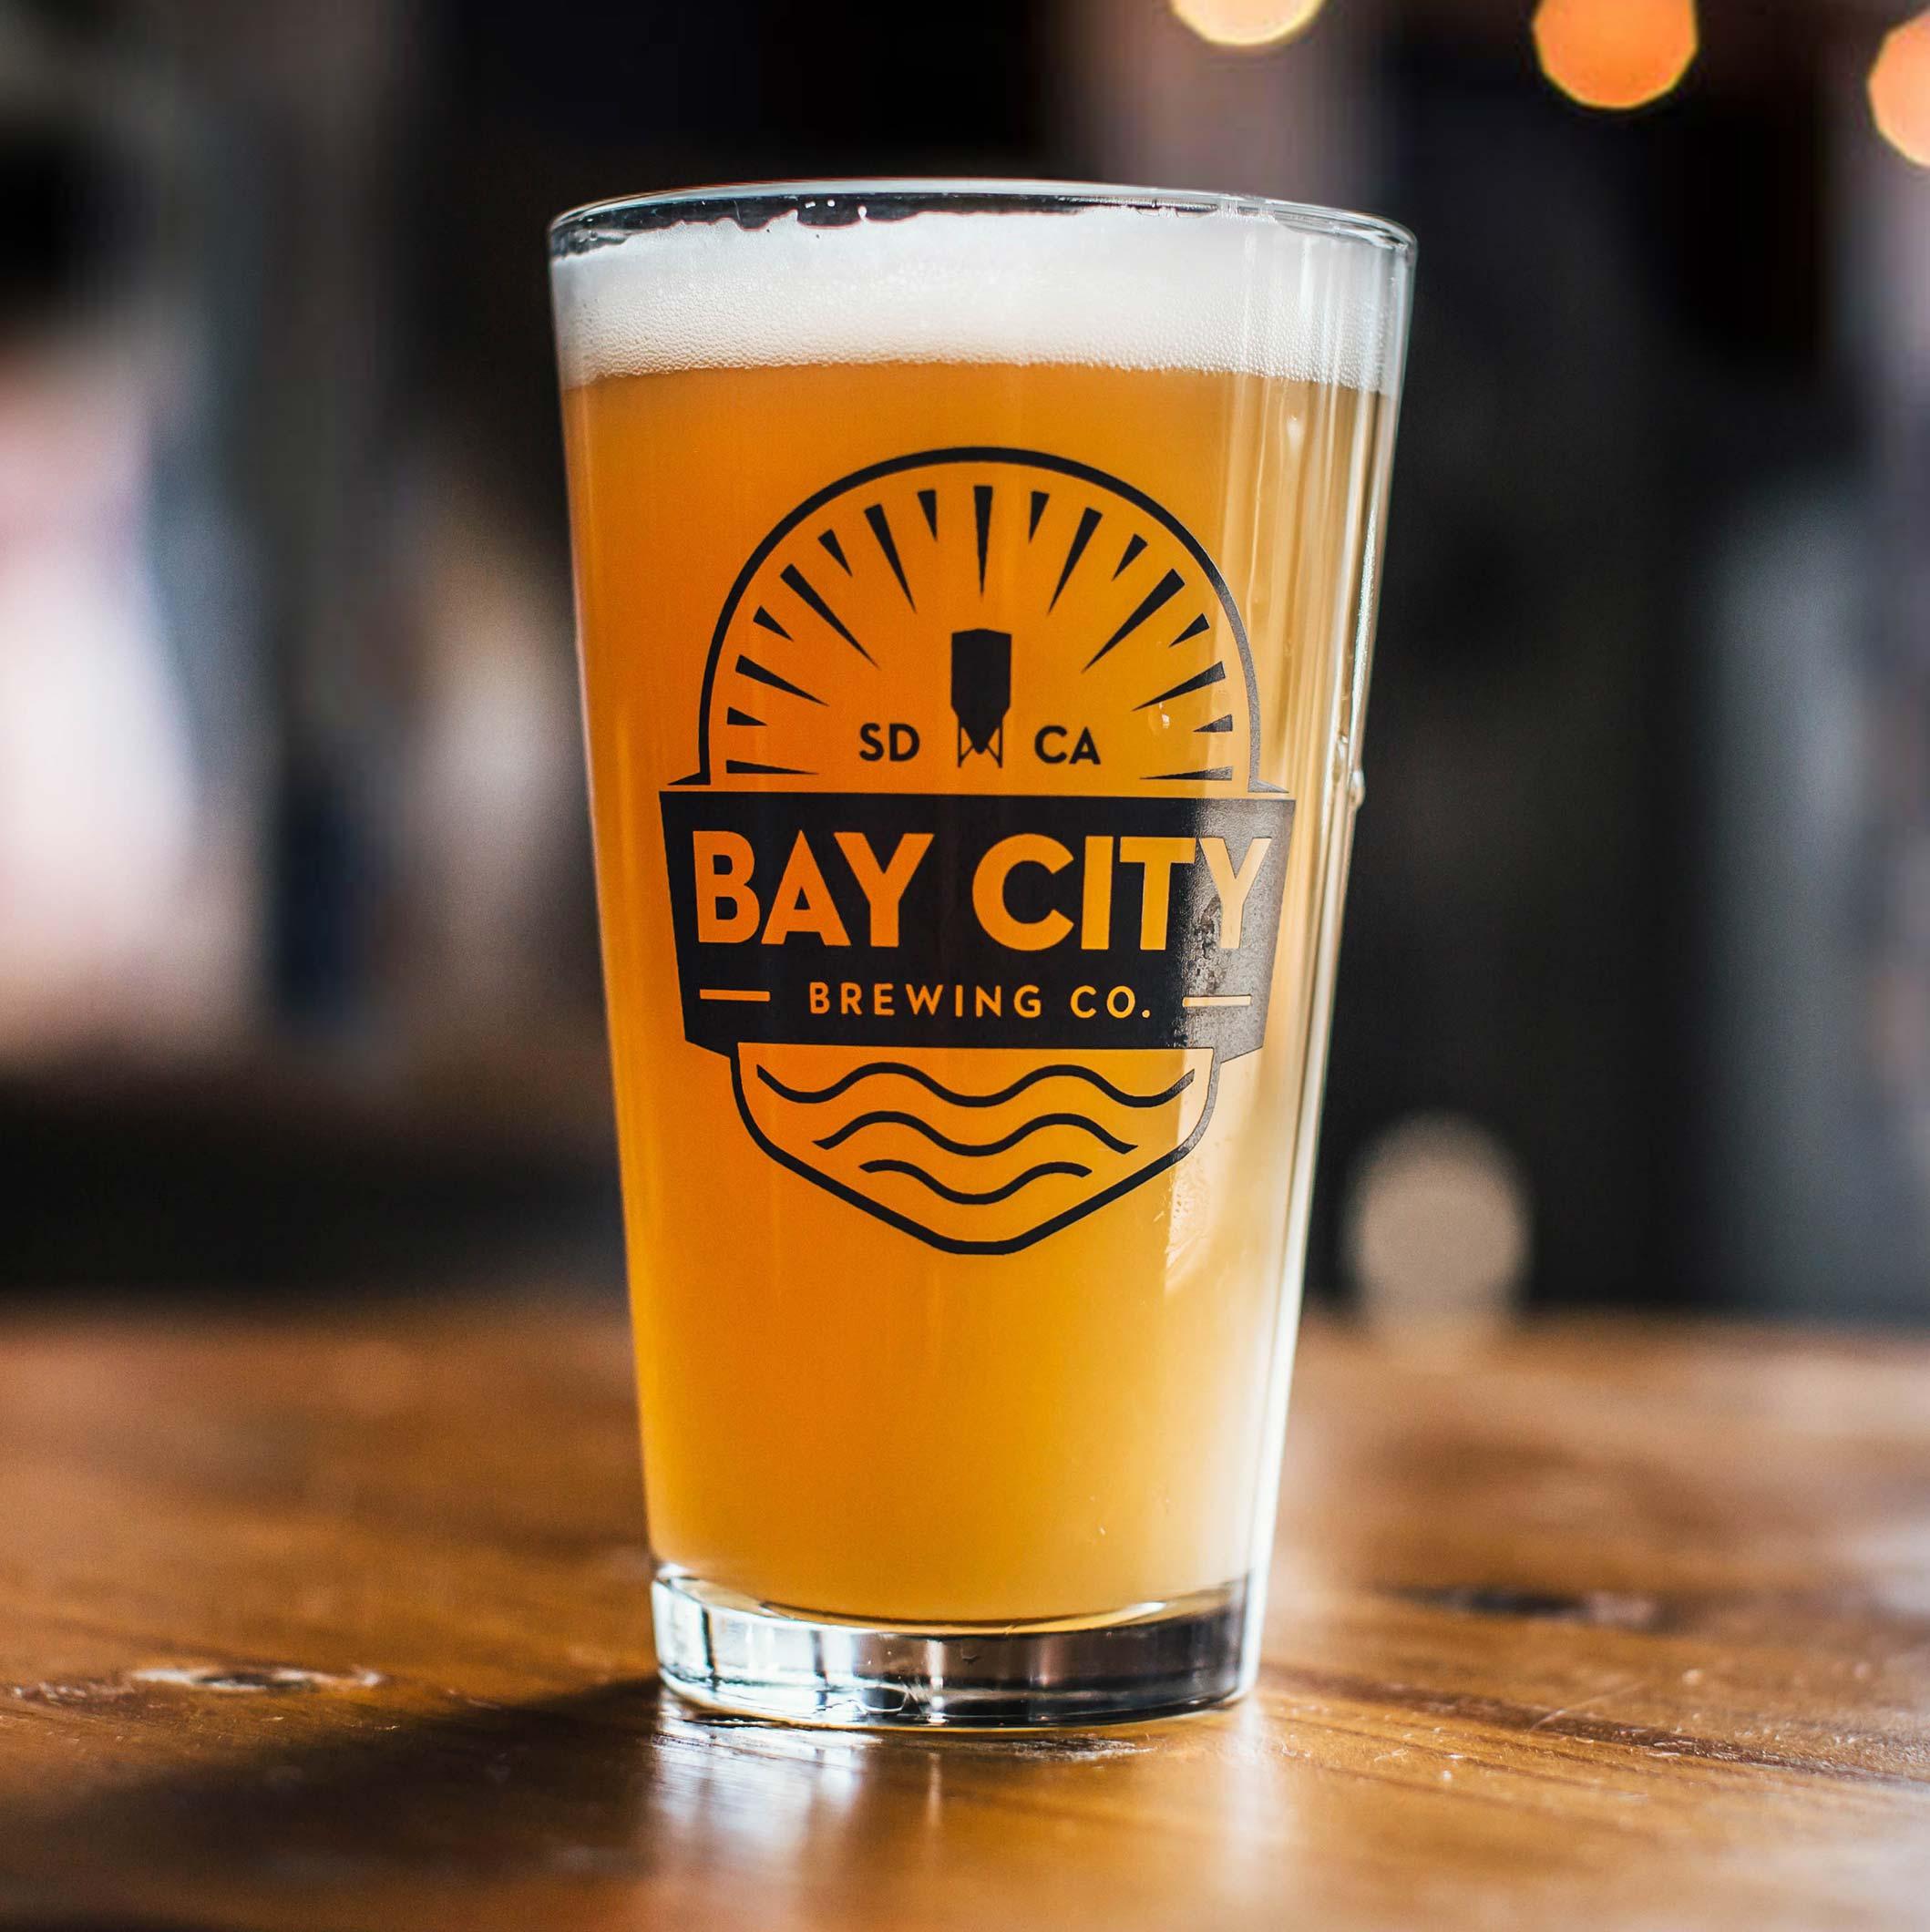 https://baycitybrewingco.com/wp-content/uploads/2020/04/bay_city_murky_machado_glass_2x.jpg